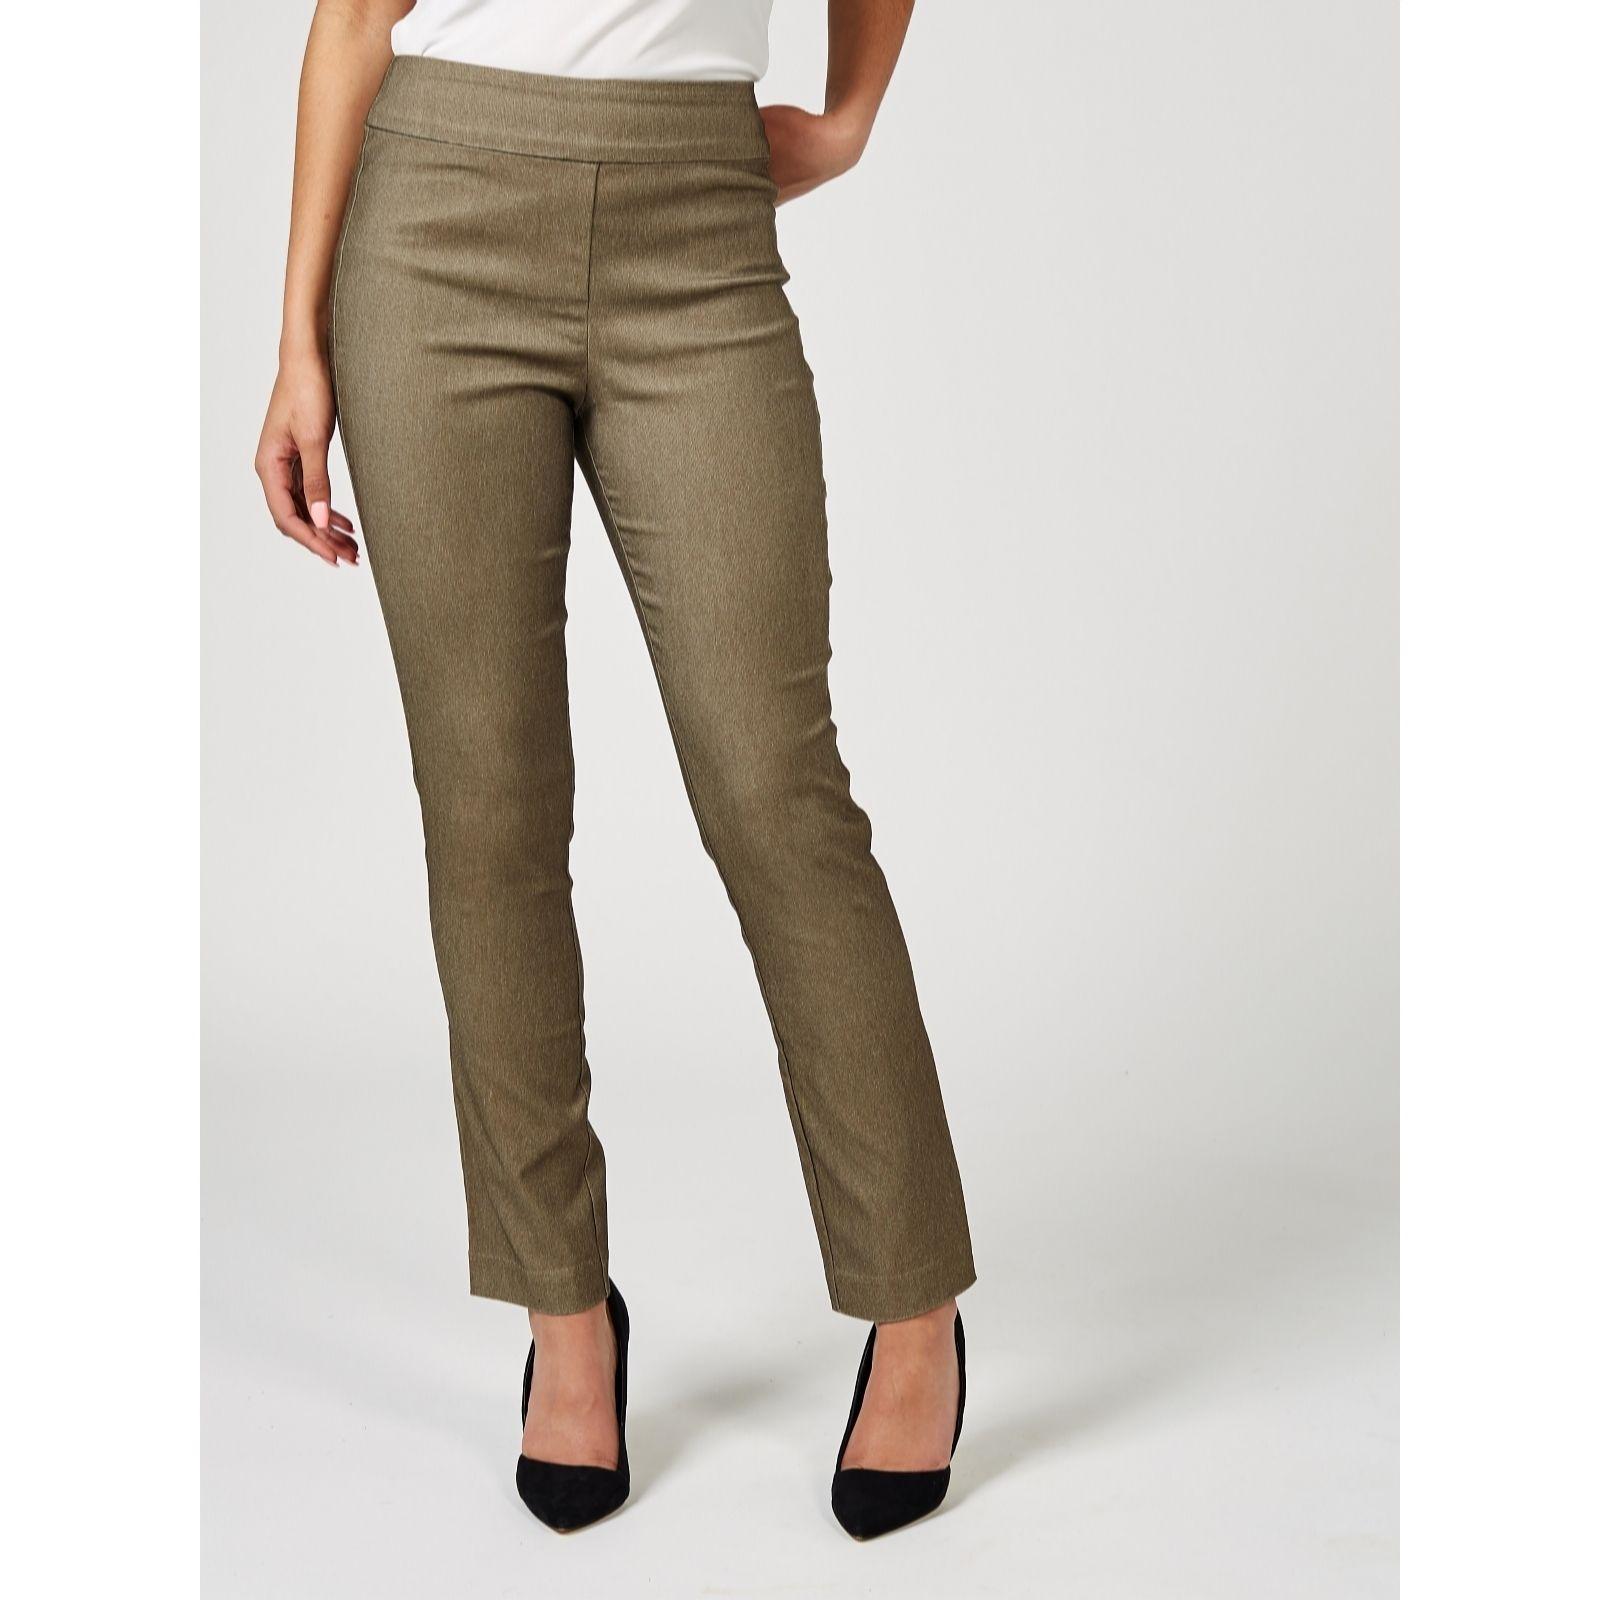 Marlawynne Cross Dyed Mesh Panel Straight Leg 32 Length Trouser